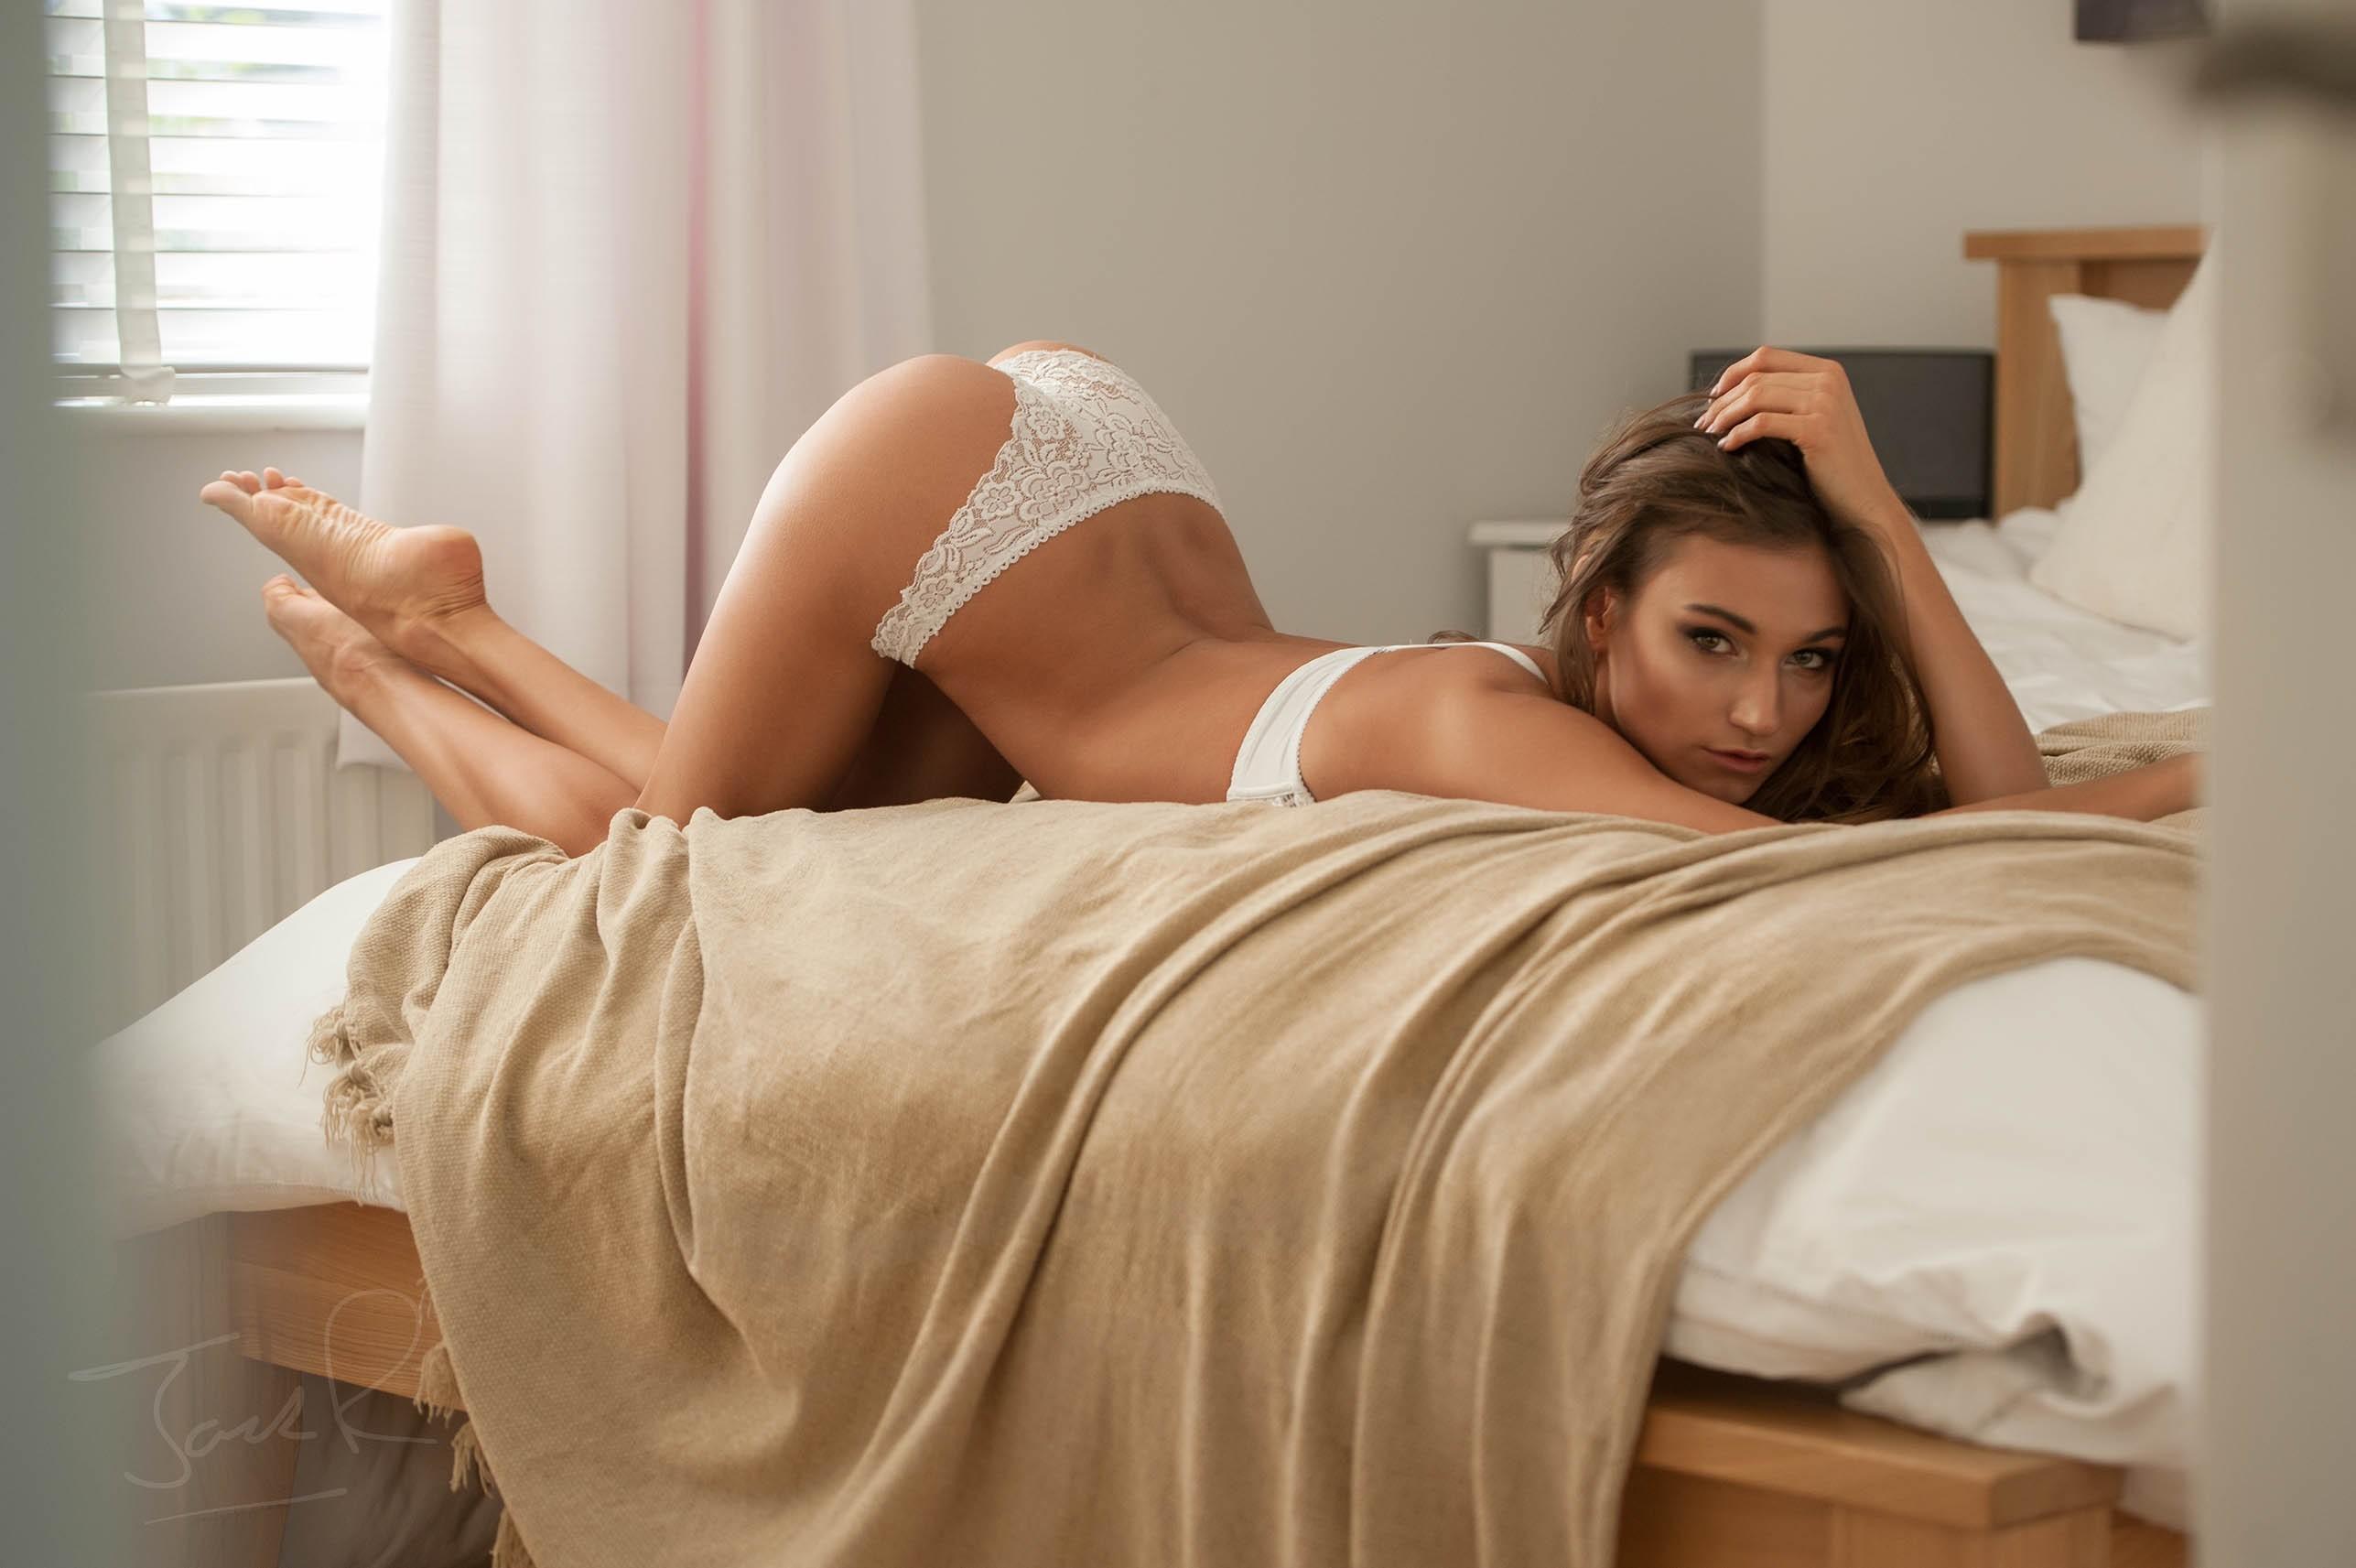 Рачком на кровати фото онлайн дрочат кончают